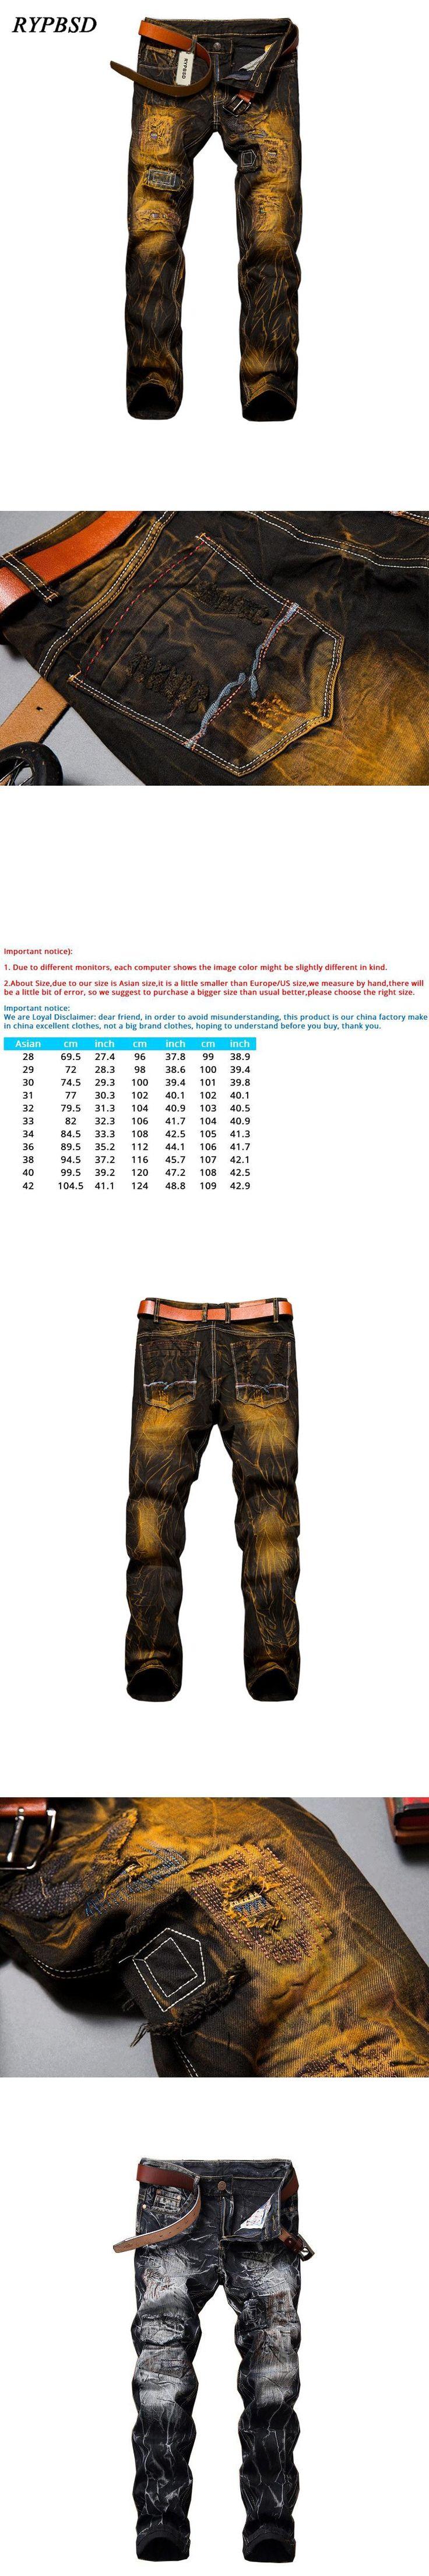 2017 Fashion Vintage Biker Ripped Jeans Men Slim Hip Hop Denim Patch Distressed Jeans Joggers Male Straight Trousers Size 28-42